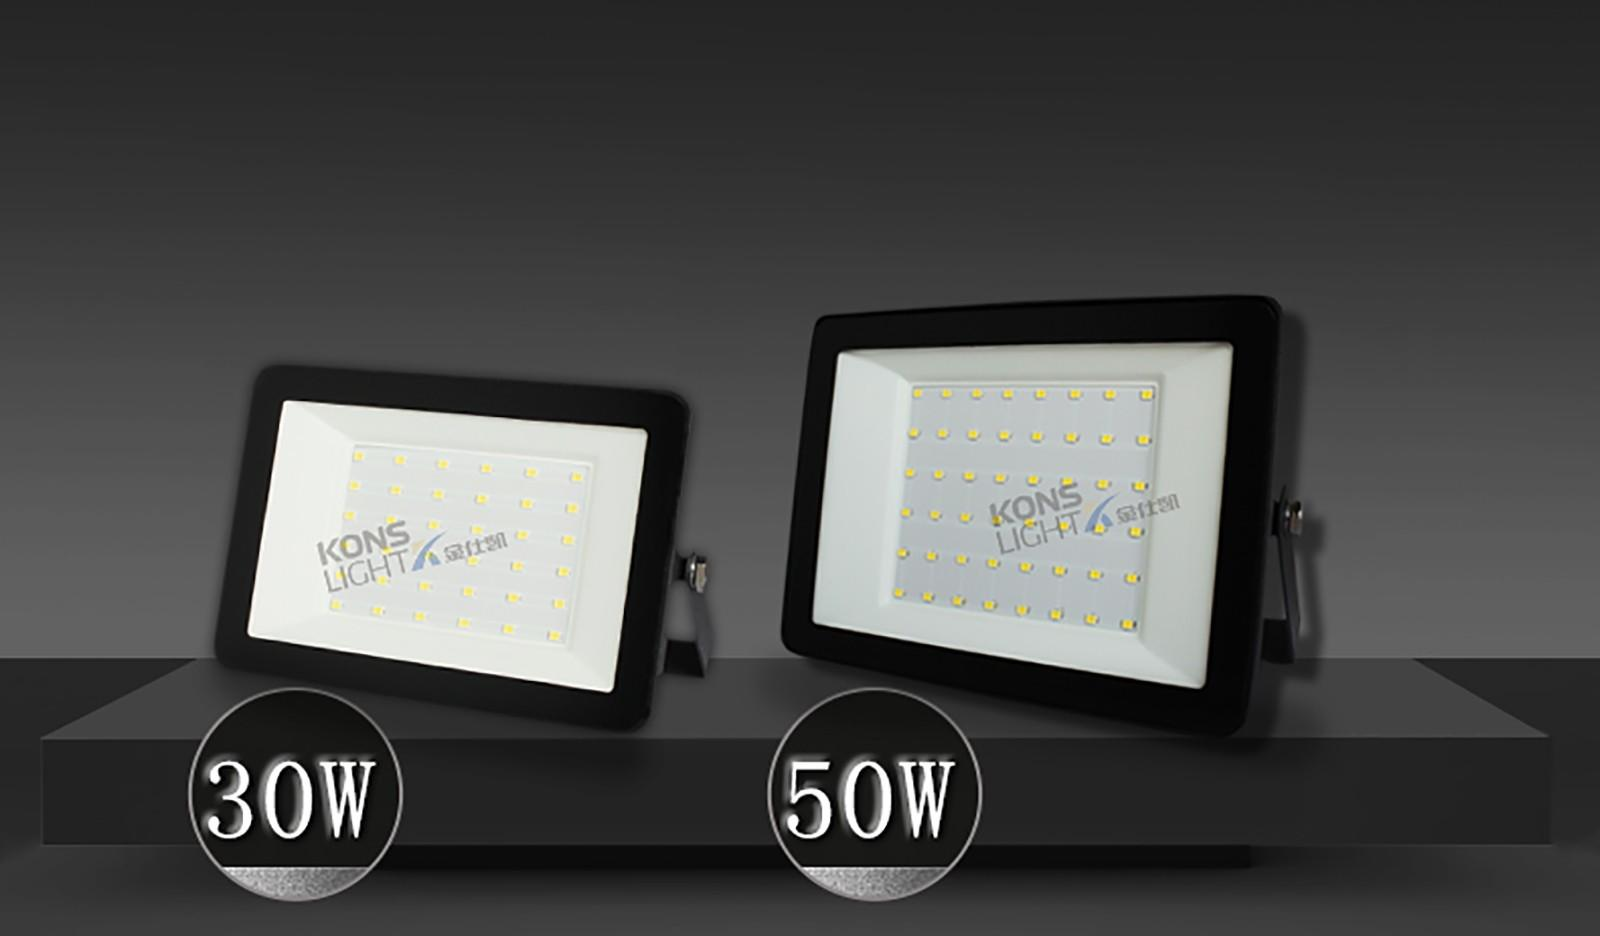 Kons-Led Light Supplier Led Flood Light 10w-300w 3000k-5700k Uv Resistance-1